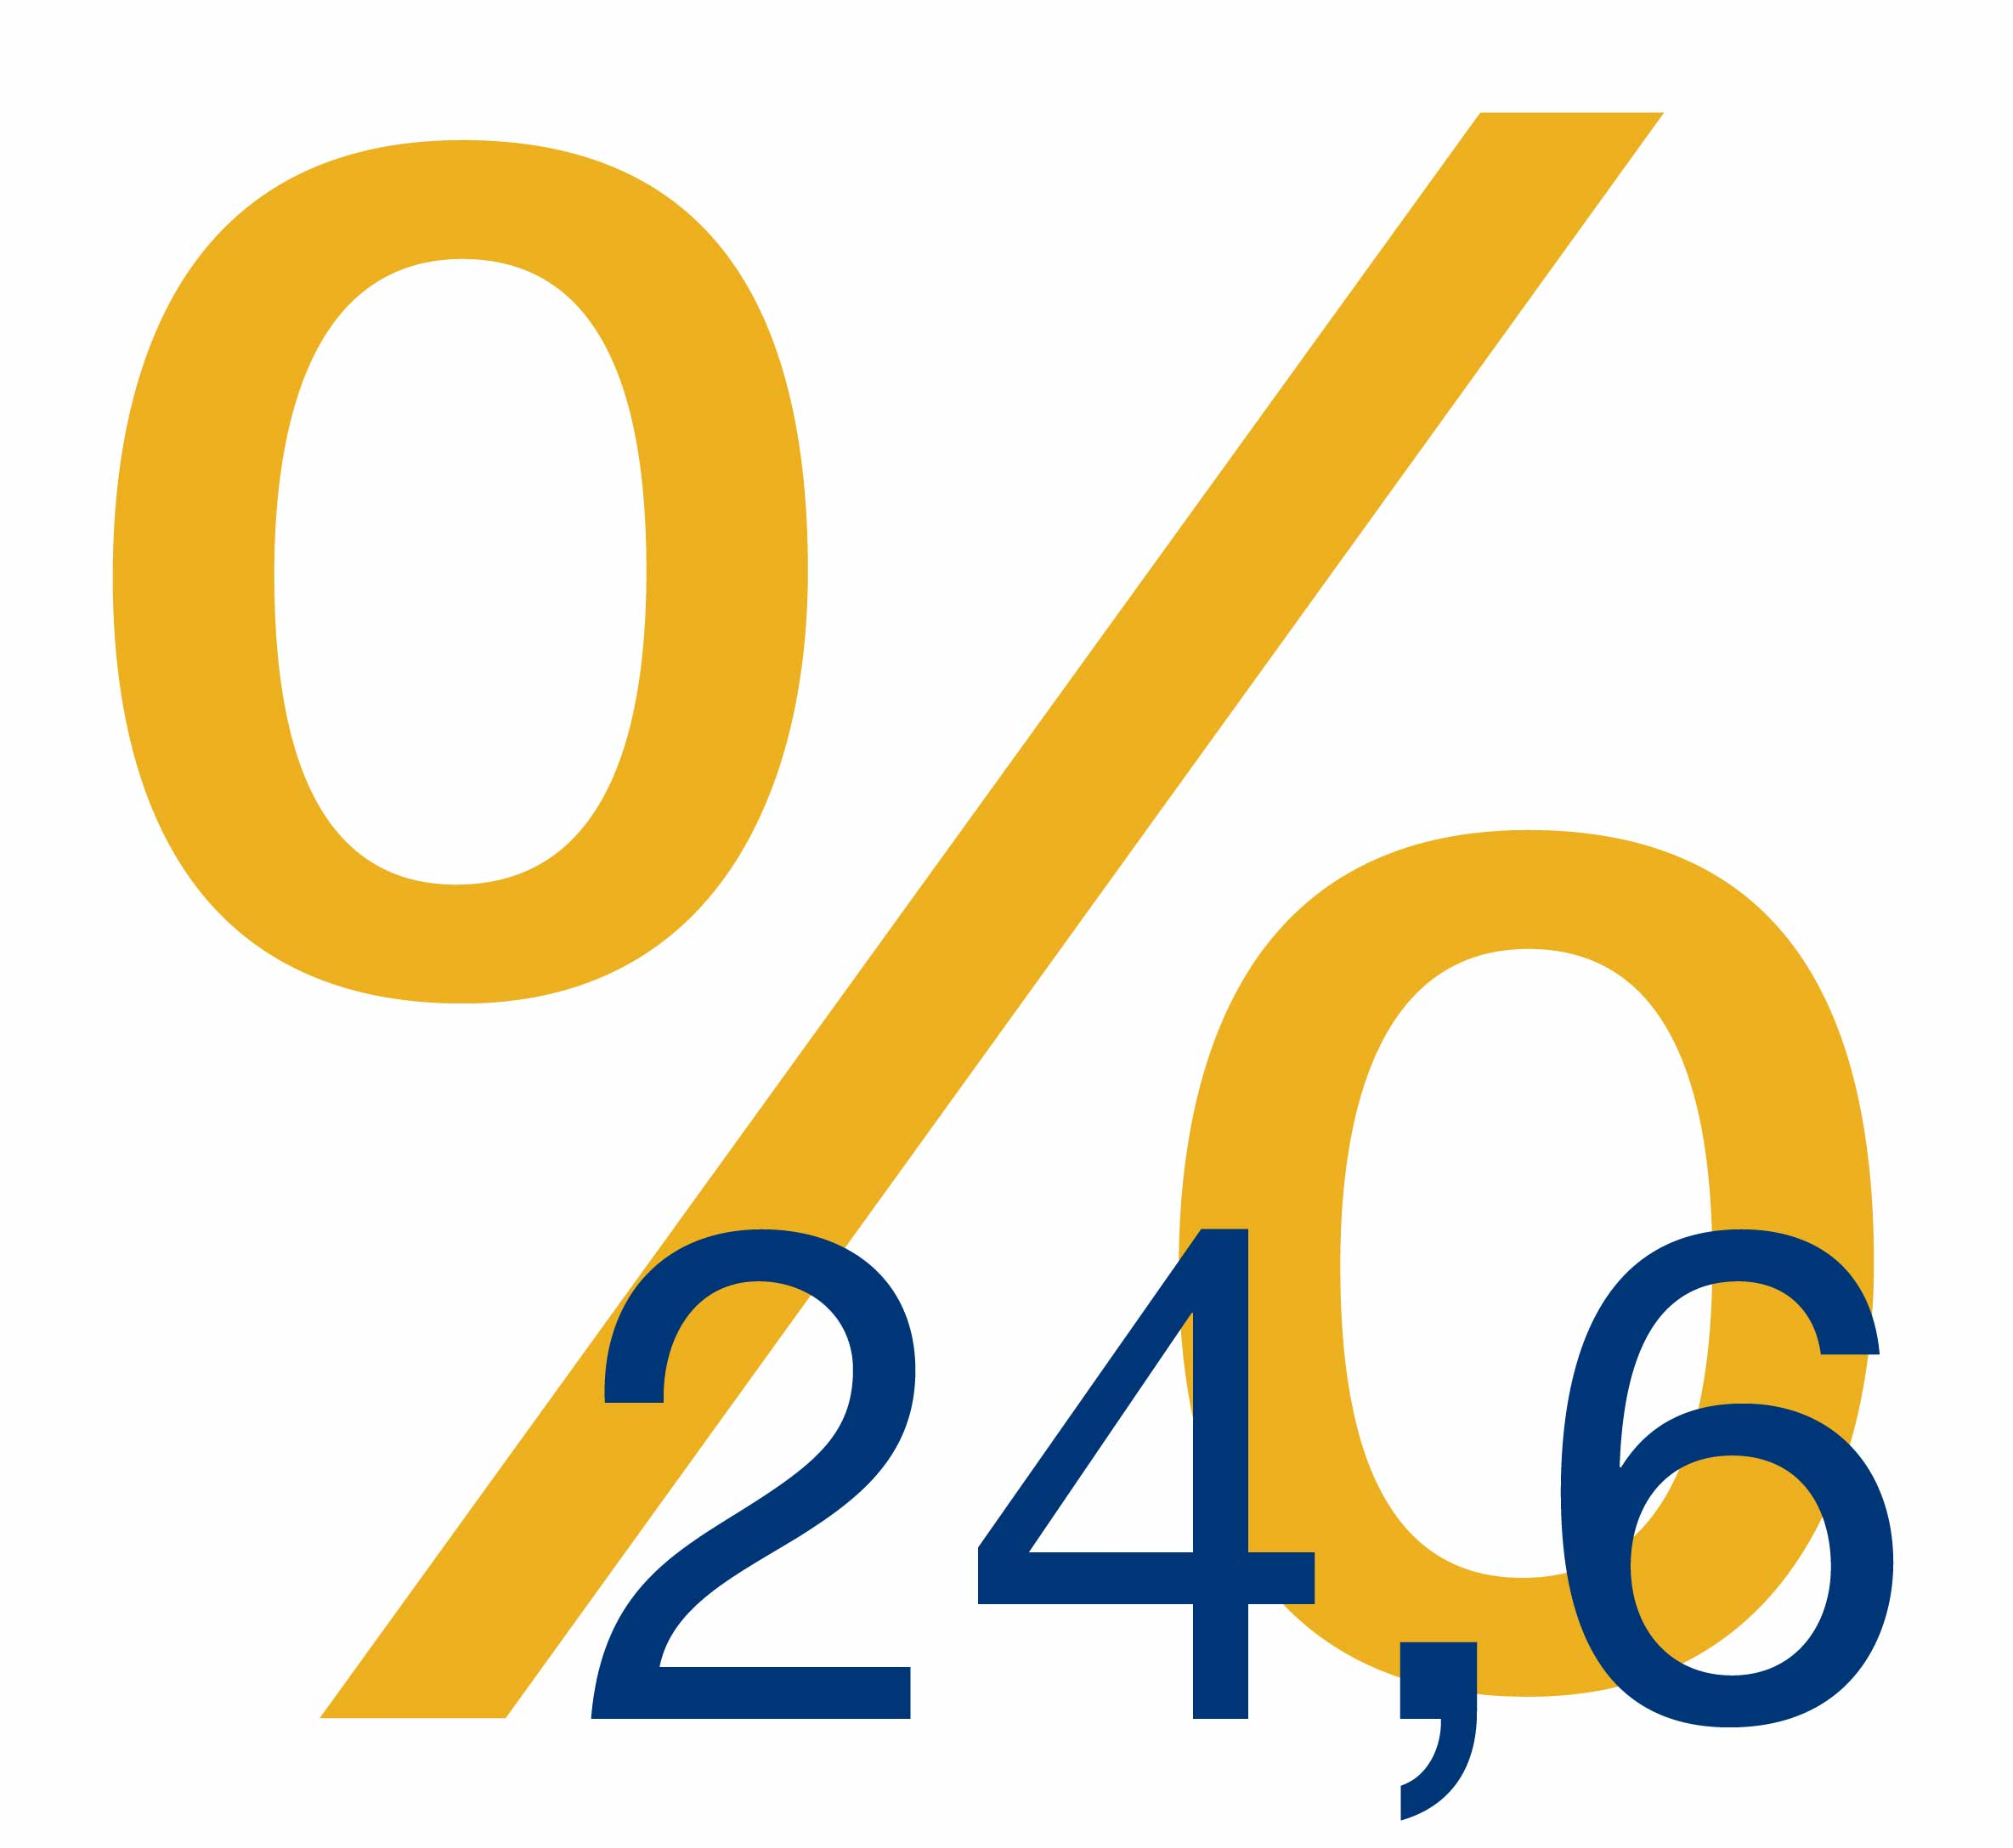 24,6 %